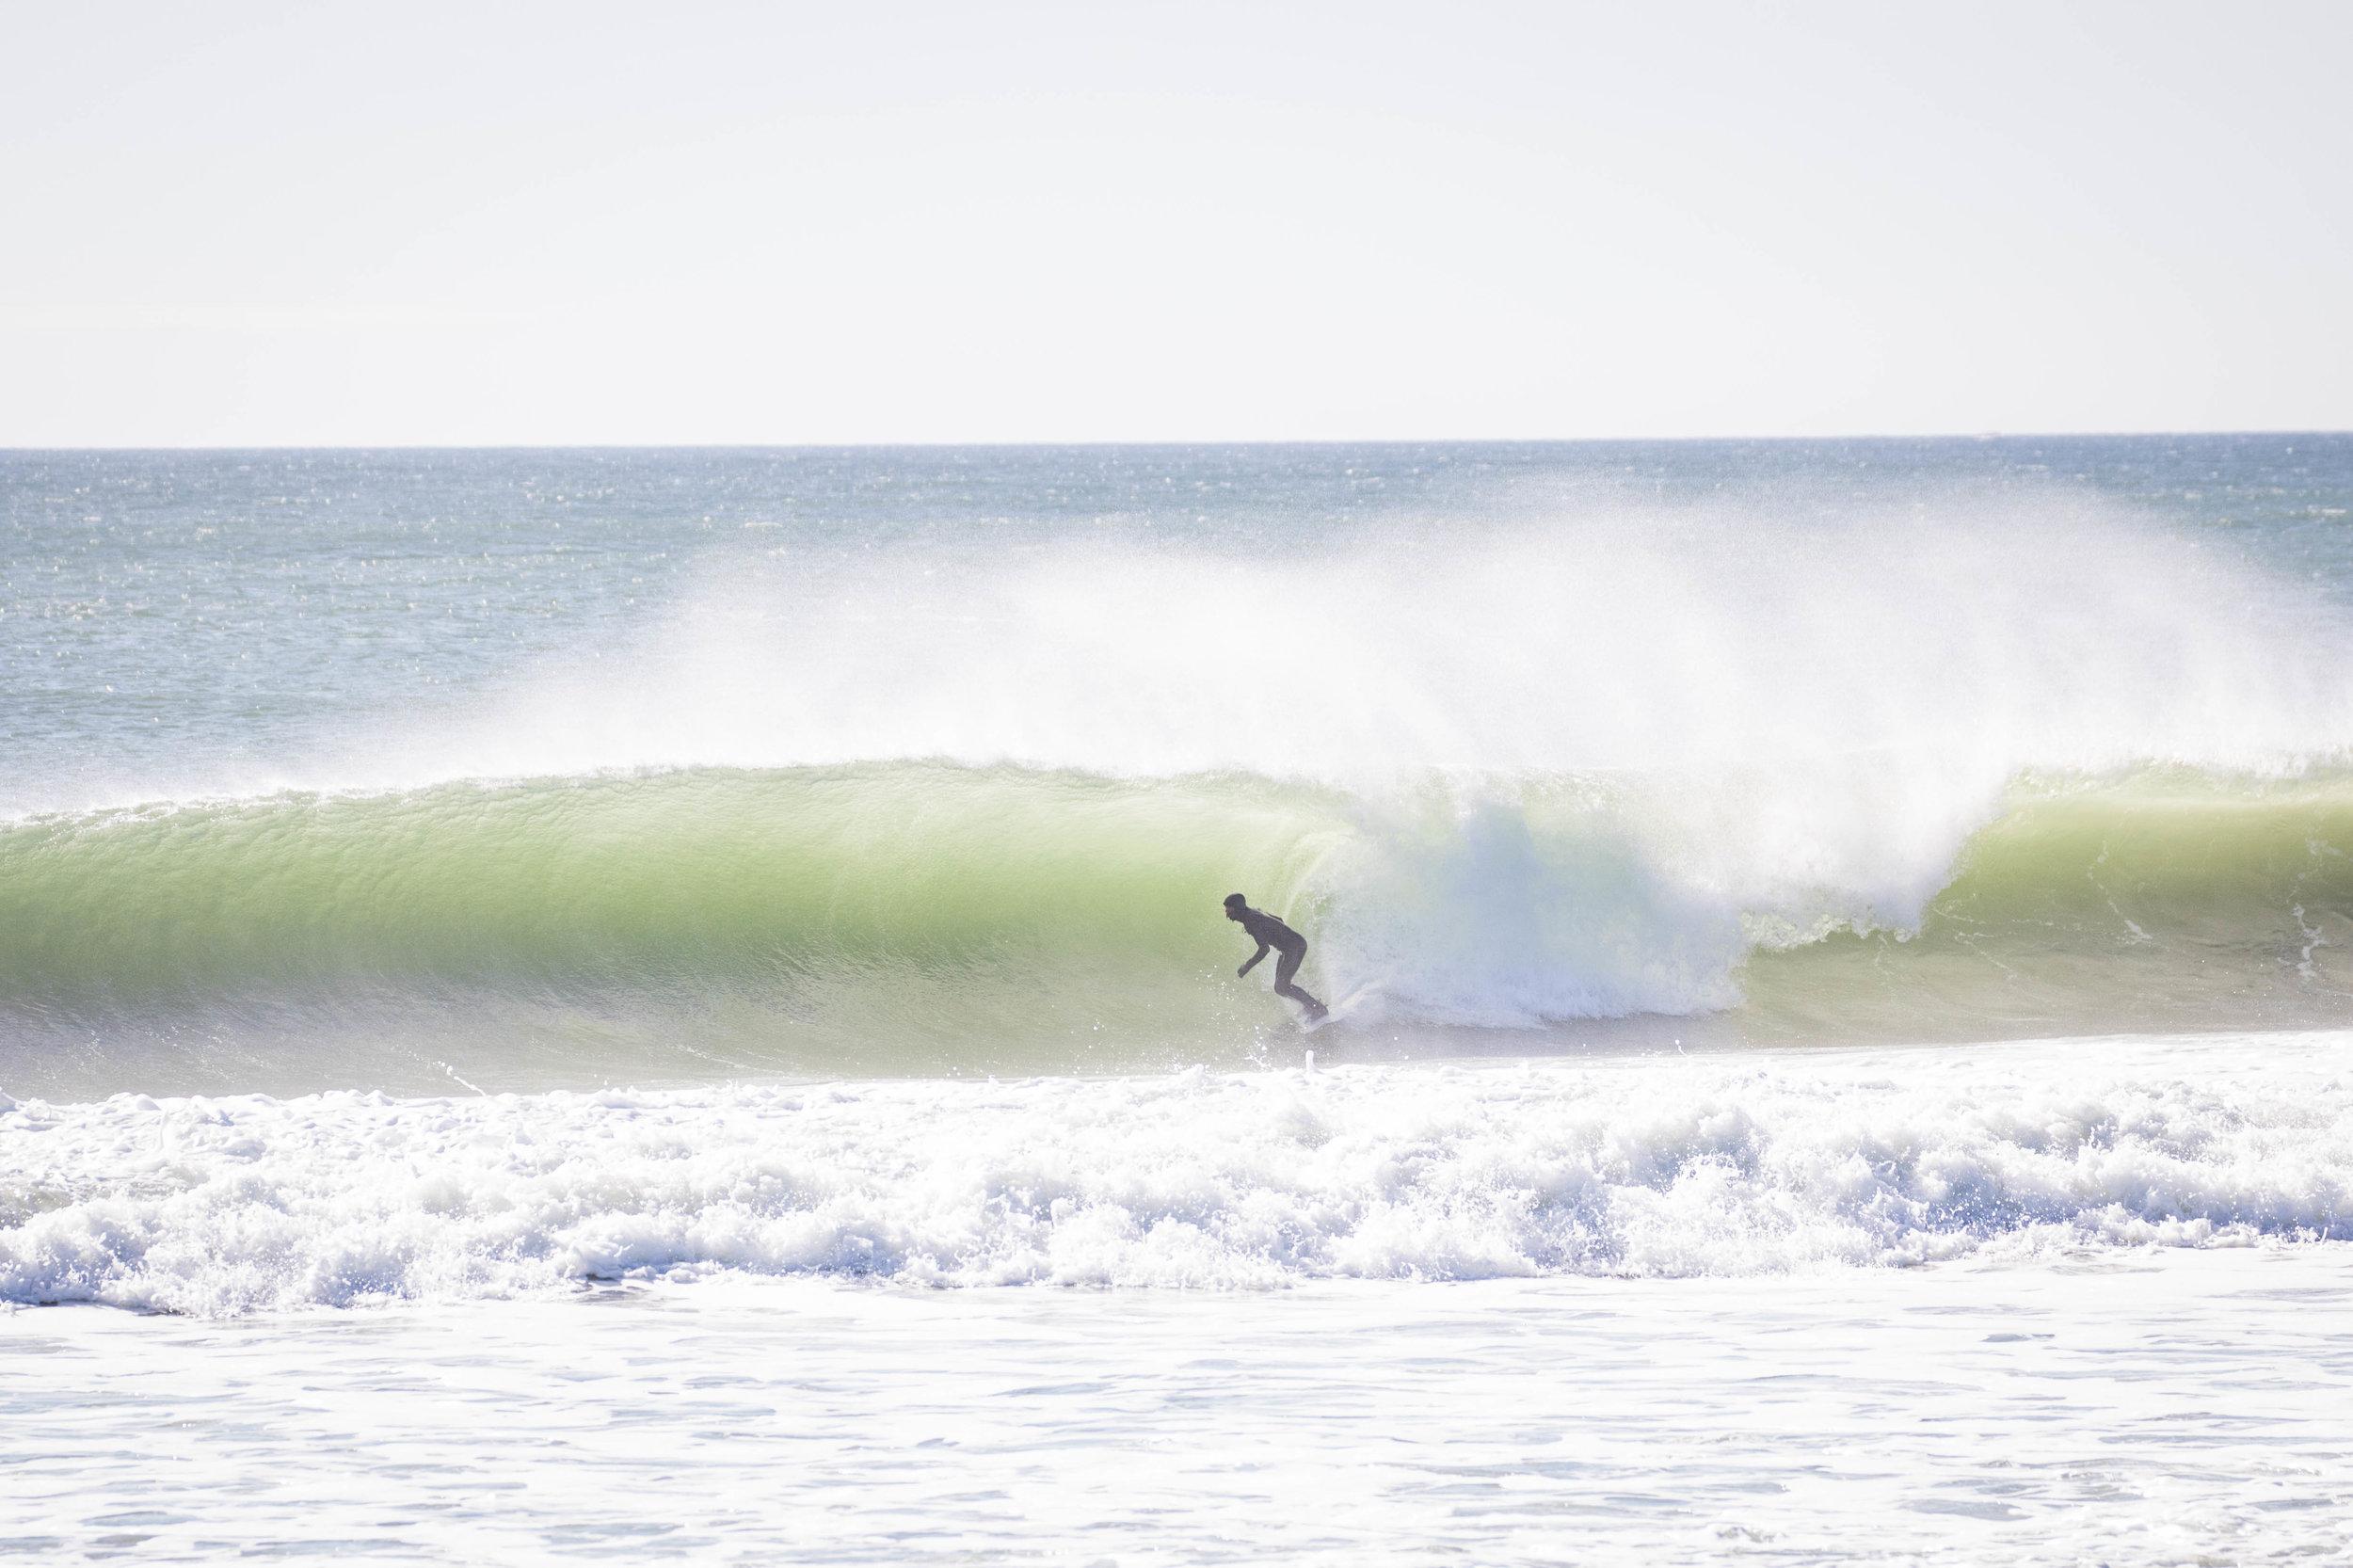 4-26-18 Mantoloking Wave 54.jpg